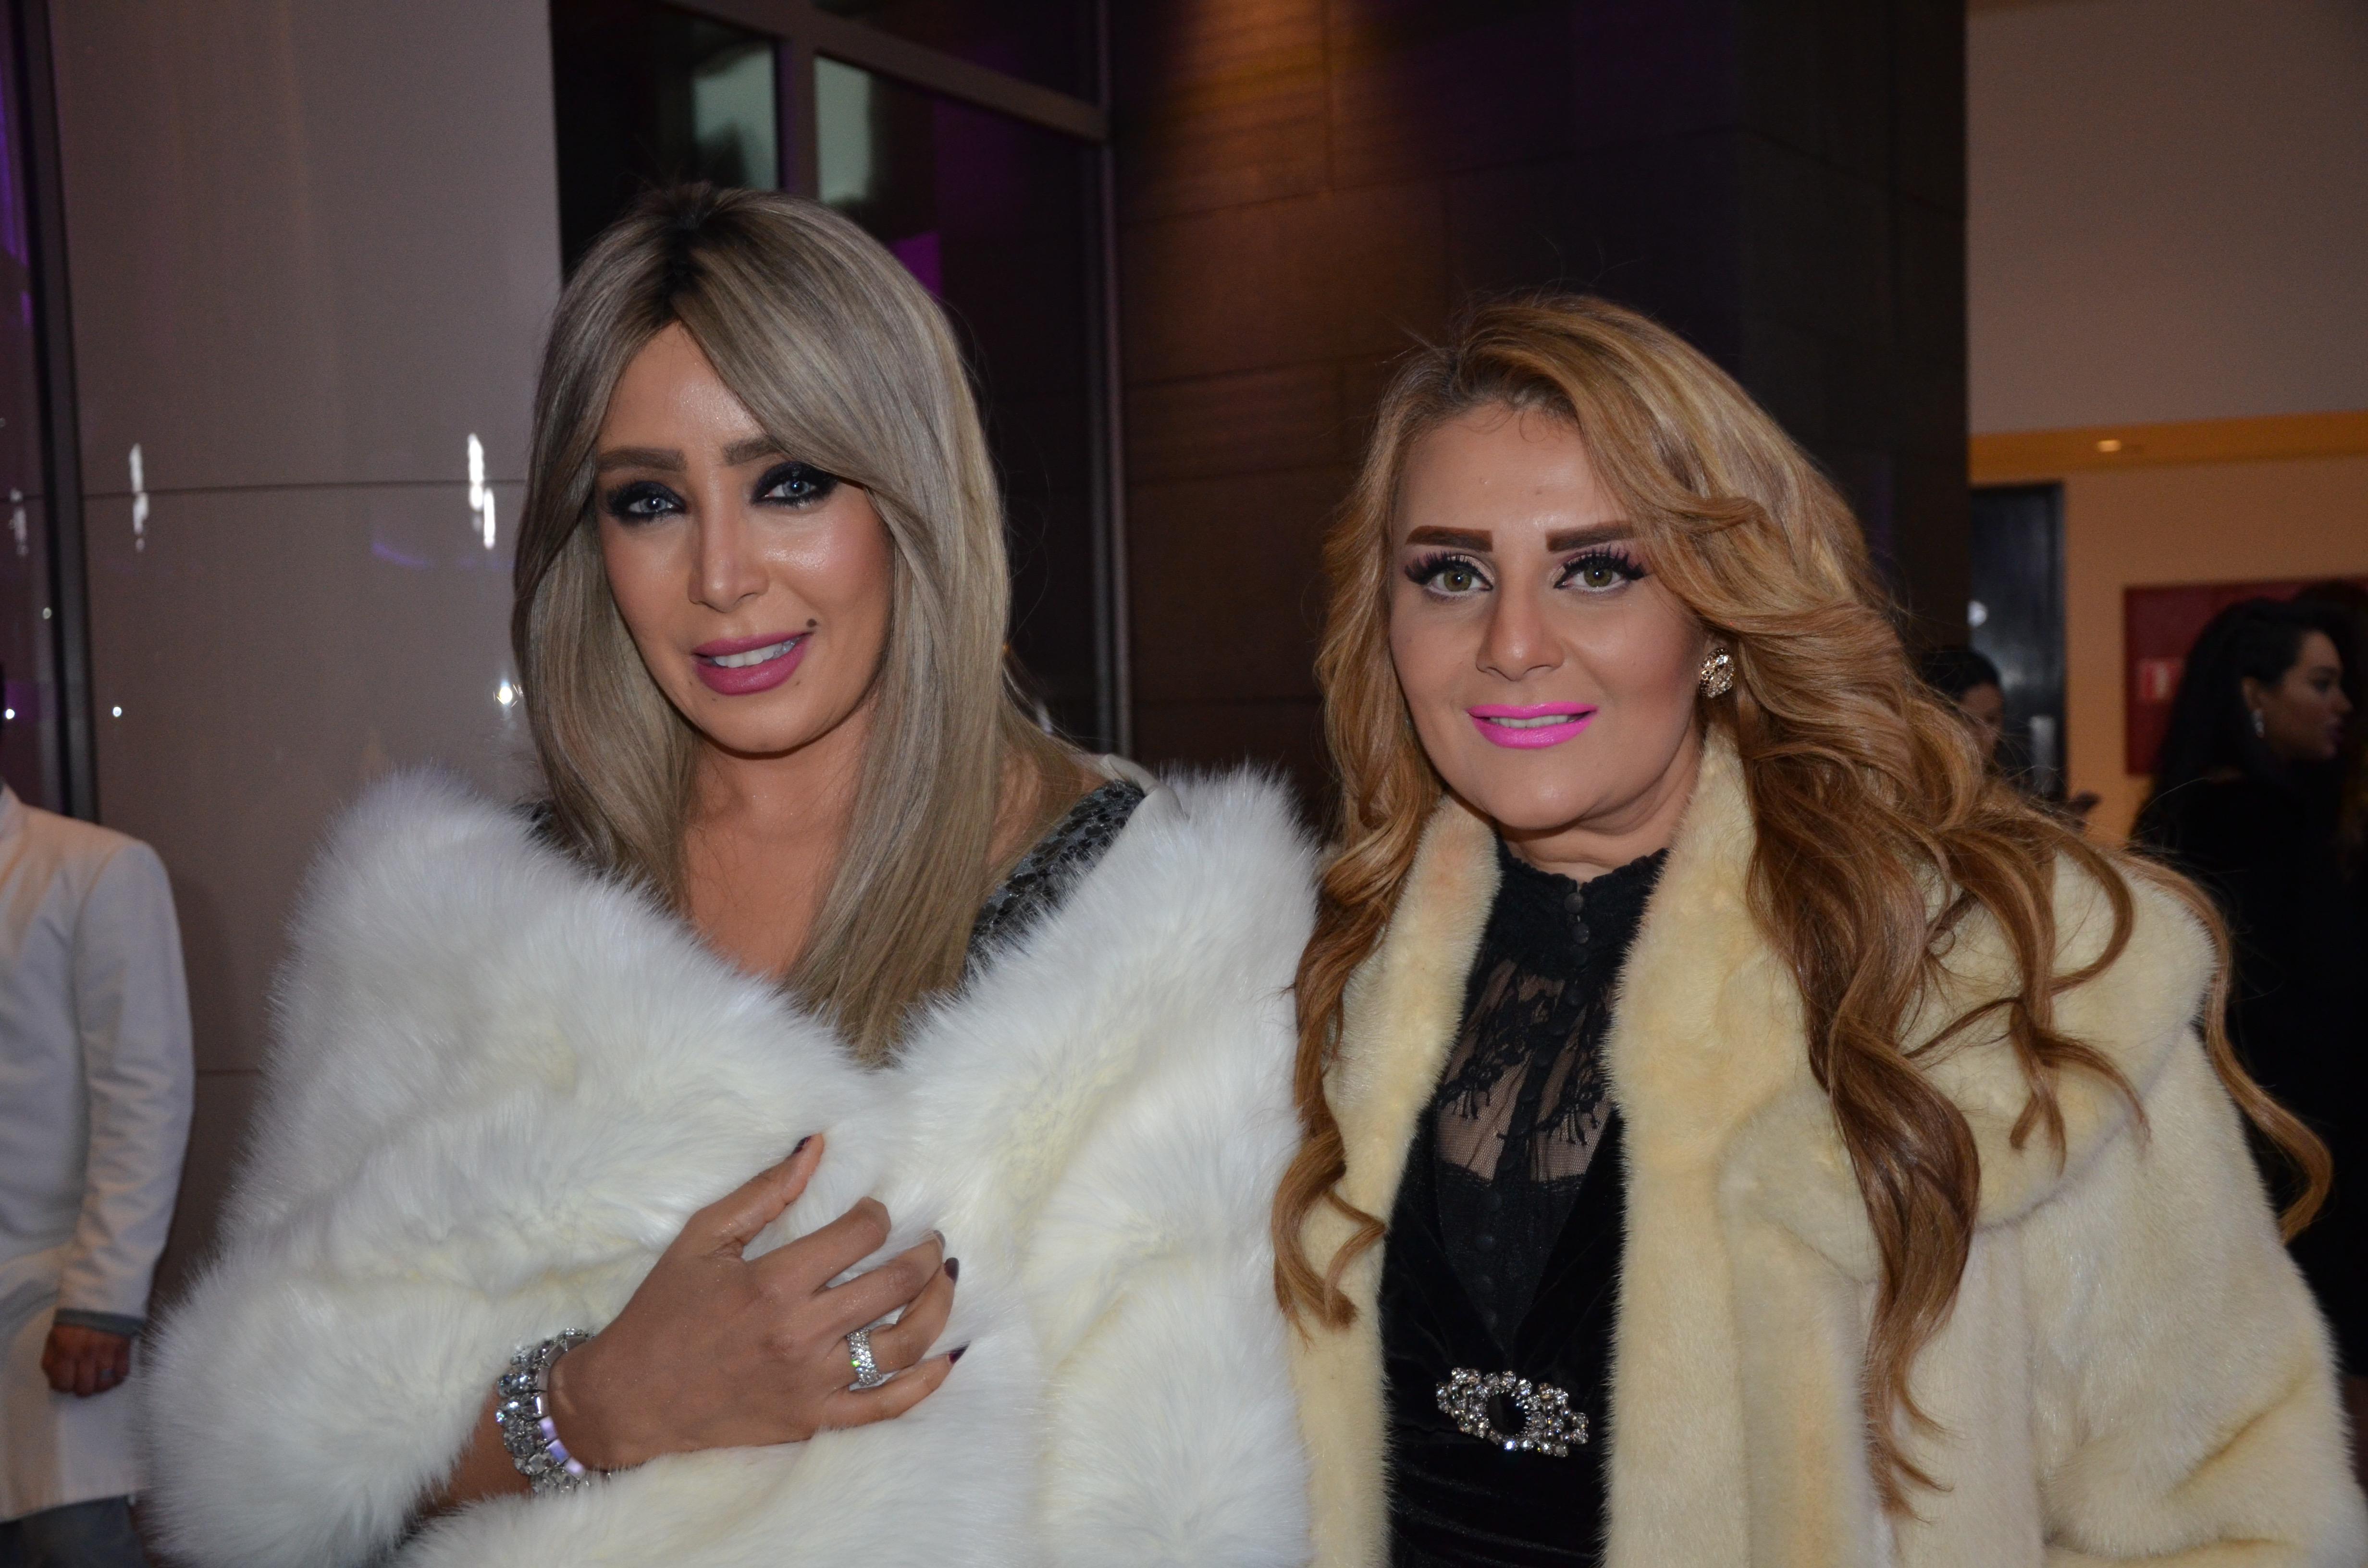 Iman Abu Taleb and Rania Mahmoud Yassin